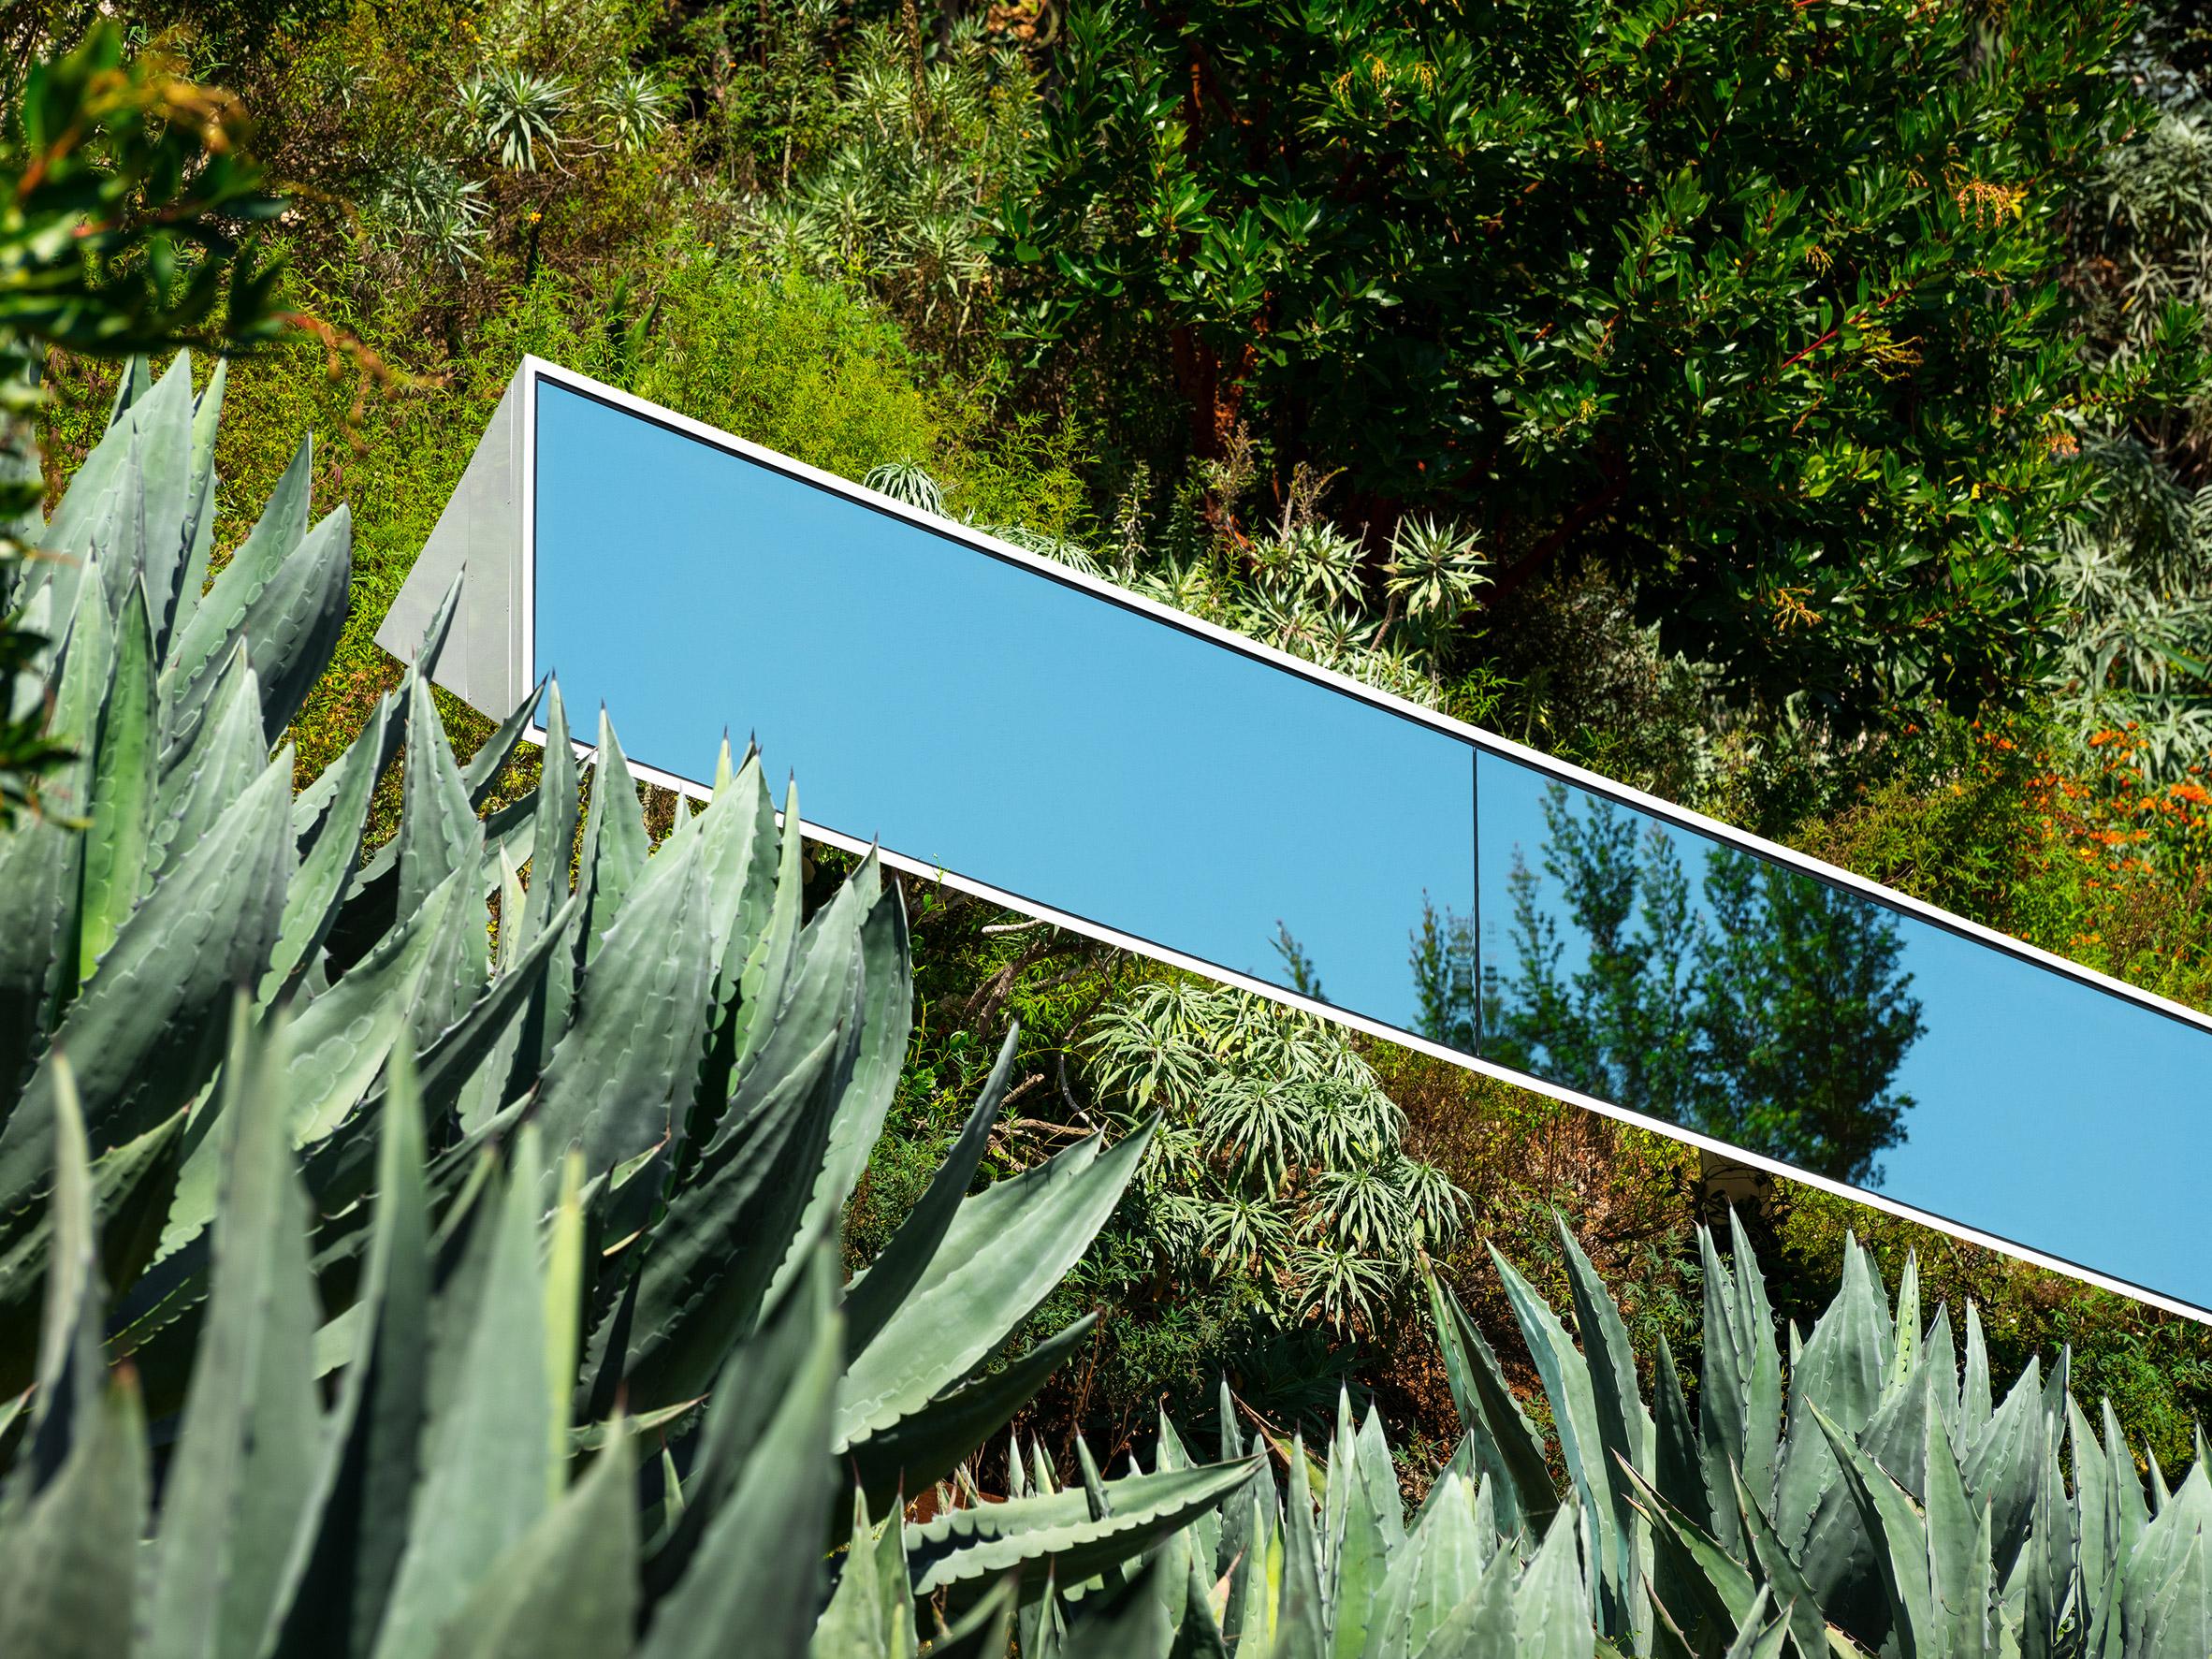 Santa Monica Linear is a mirrored sculpture in California